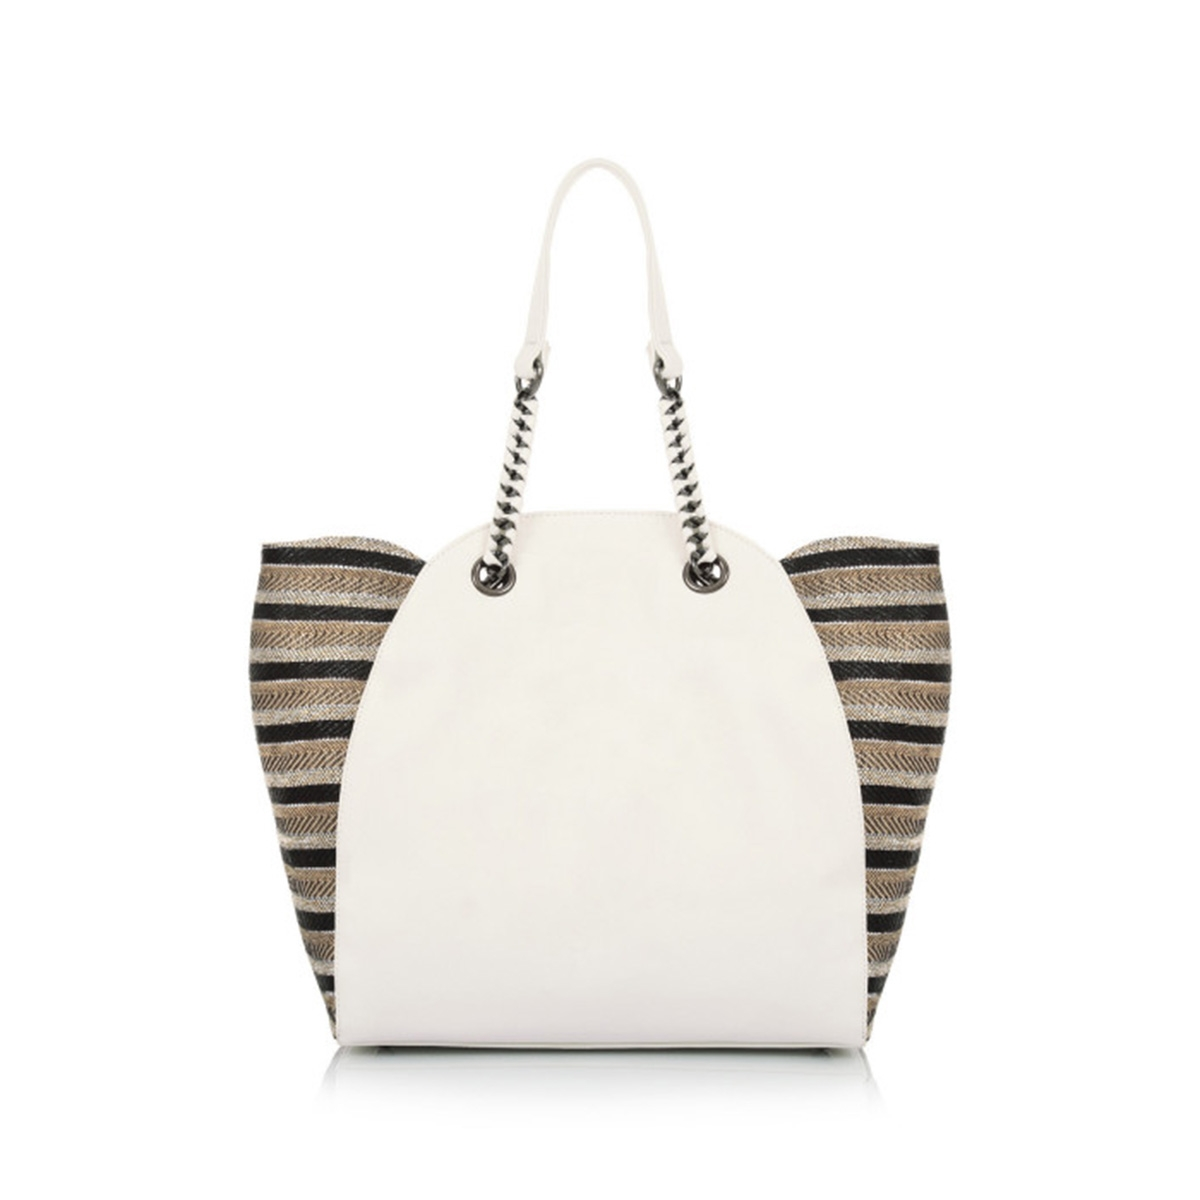 ecb622b3b7 Τσάντα Ώμου Με Αλυσίδα Le Pandorine Classic Sinceri DBG02332 Λευκή ...